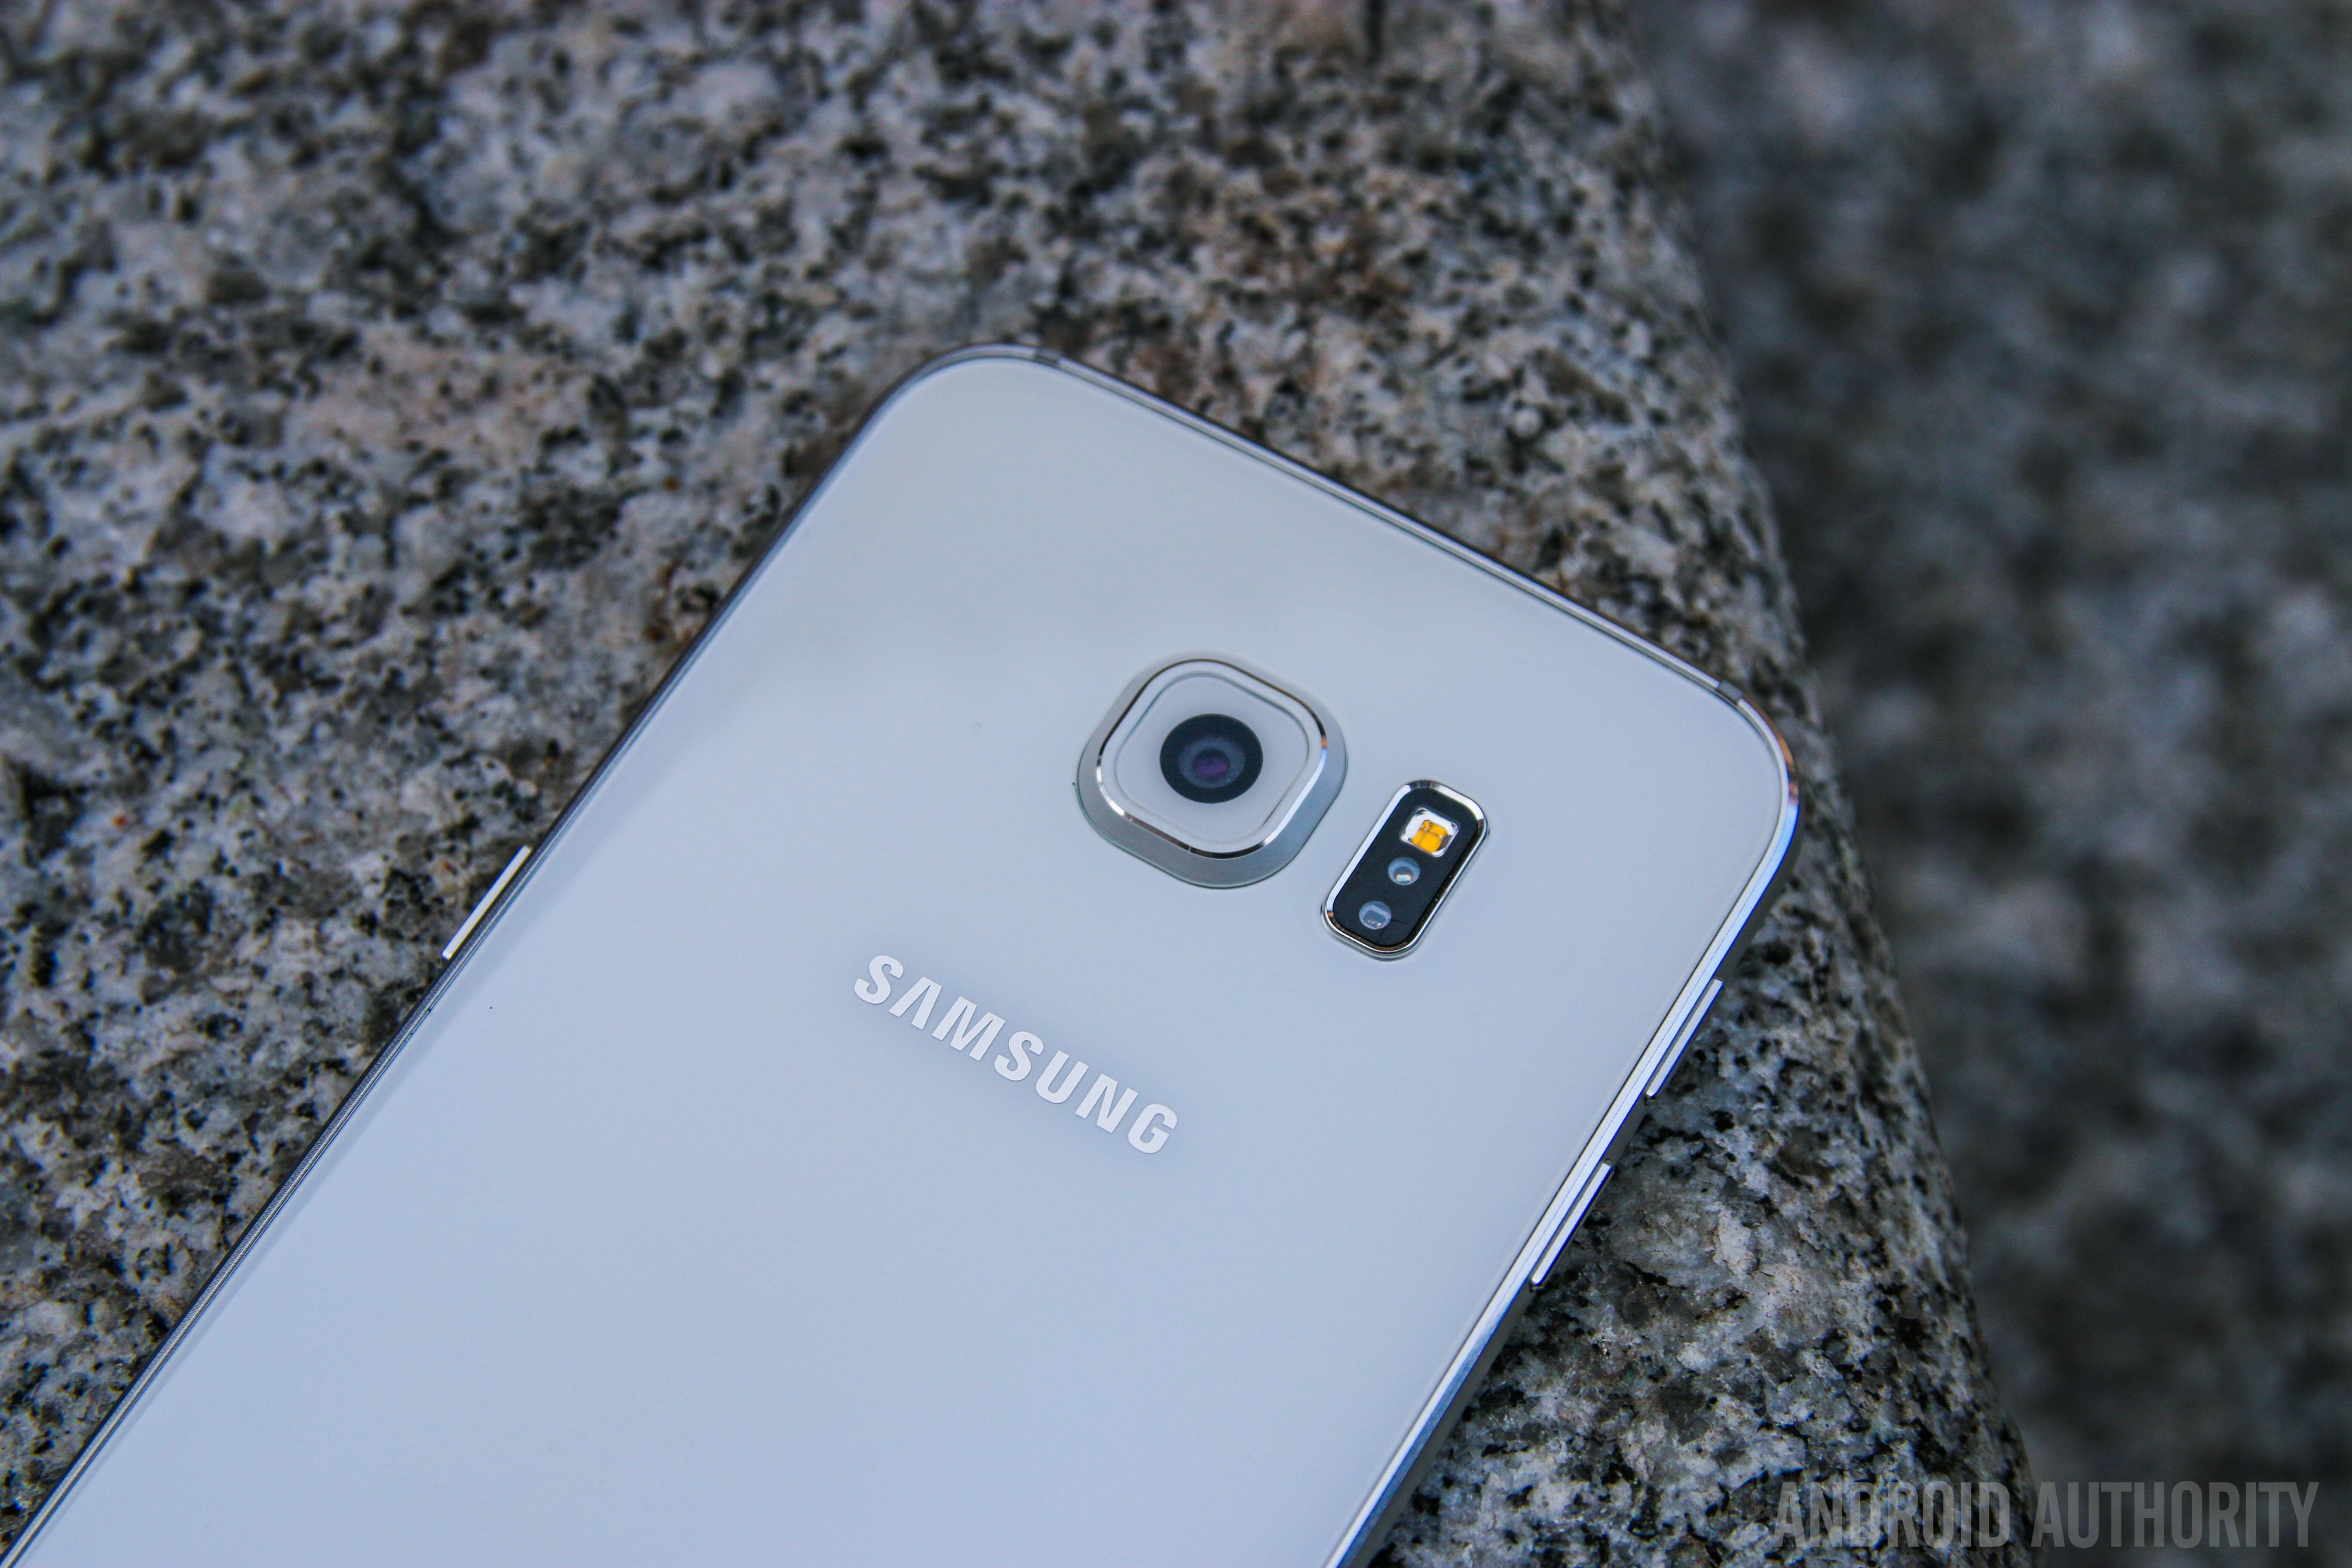 Samsung galaxy note 5 vs htc one m9 plus a comparison - Samsung Galaxy S6 Edge 6